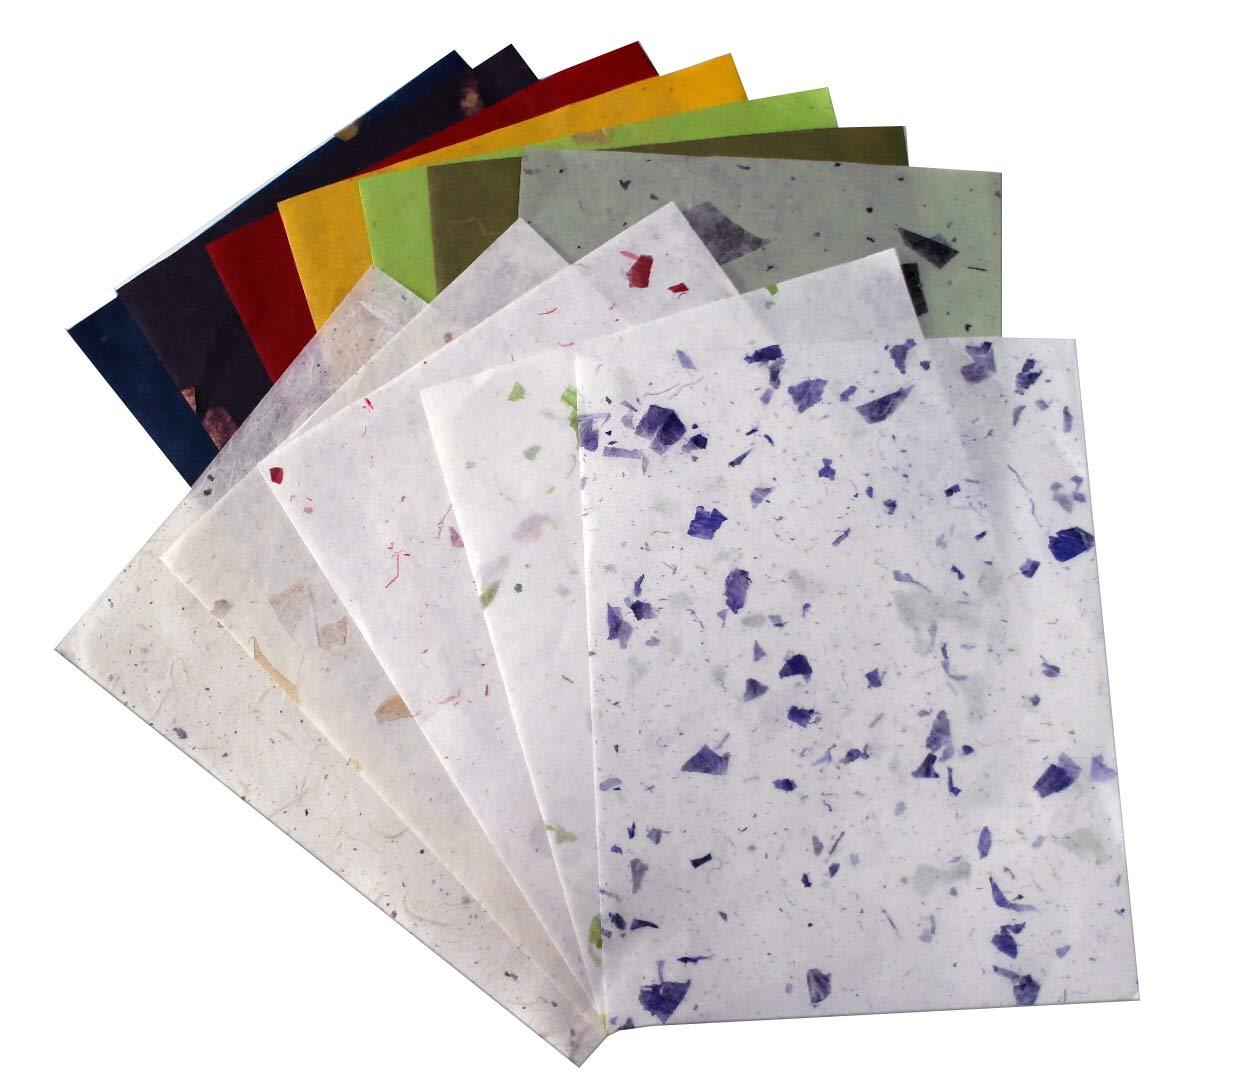 10pz Thin Mulberry pergamena cartoncino idee scrapbook design tessuto collage Art foglio di carta da parati texture background MulberryPaperStock